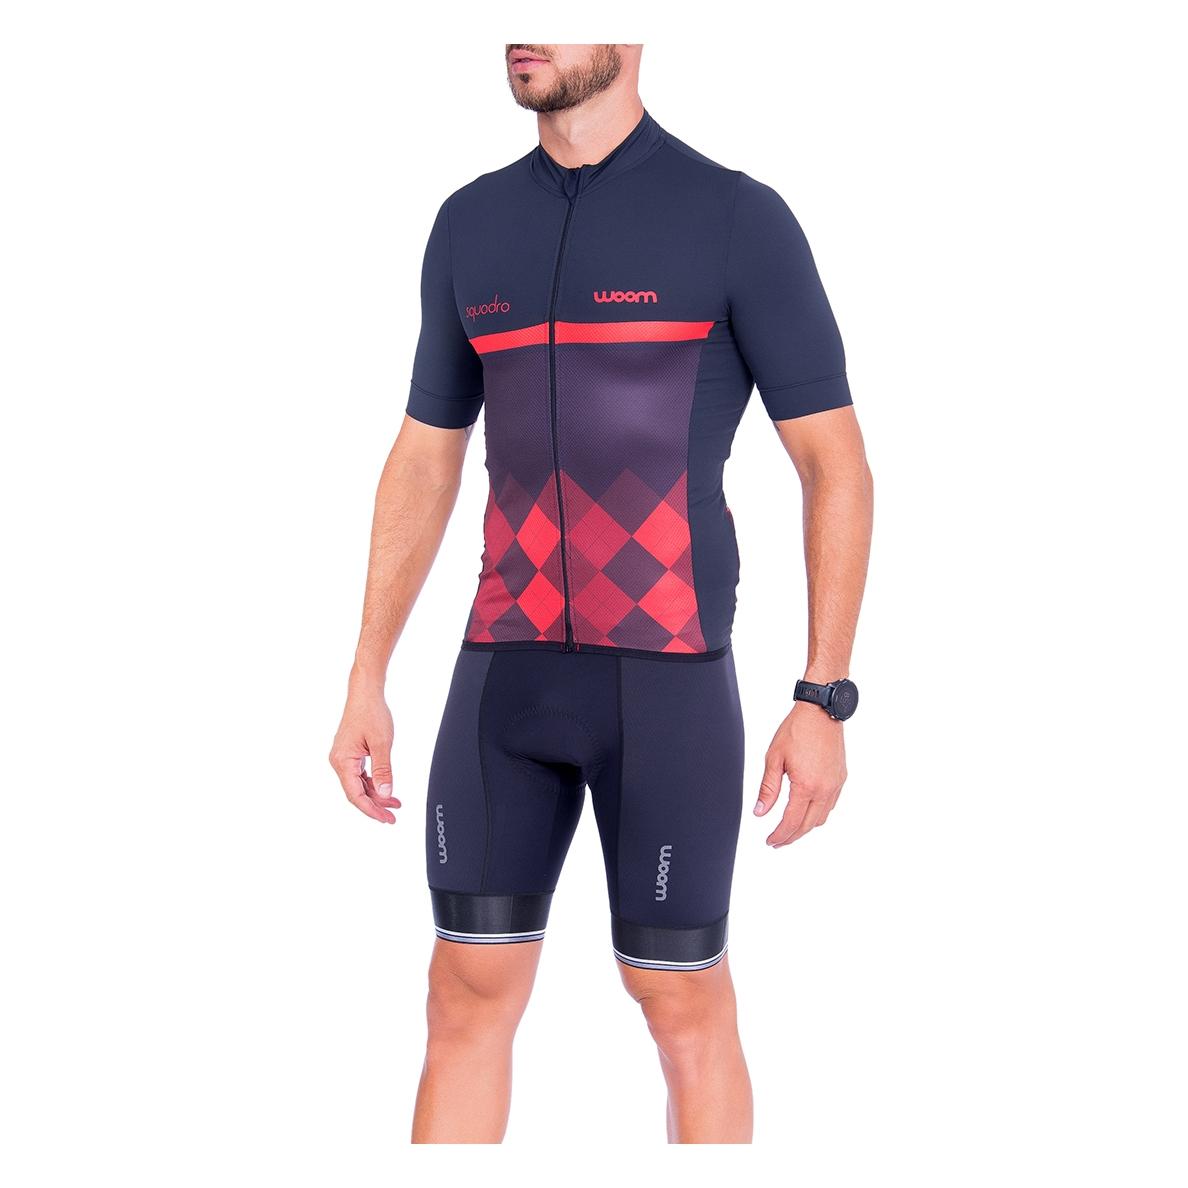 Camisa Ciclismo Squadra Palermo Masc - 2021